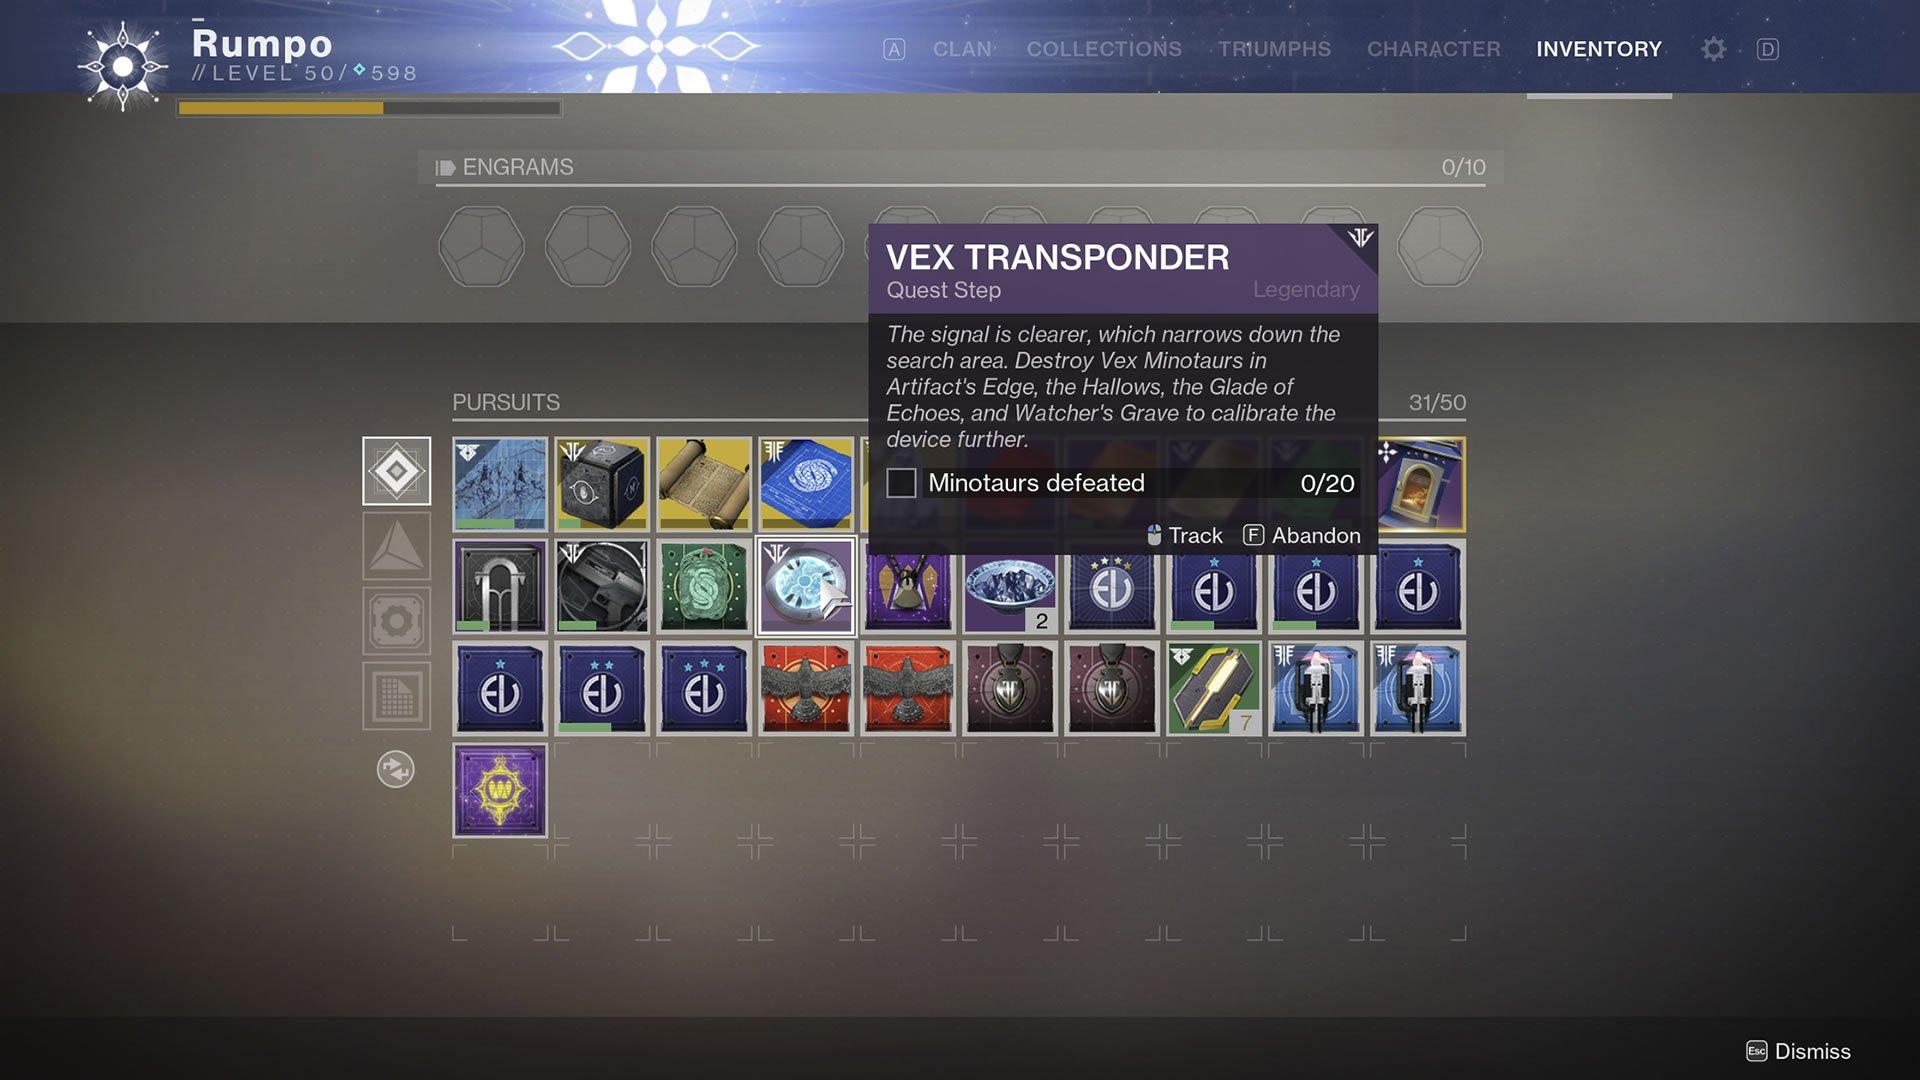 destiny 2 unlock inazami forge vex transponder 3